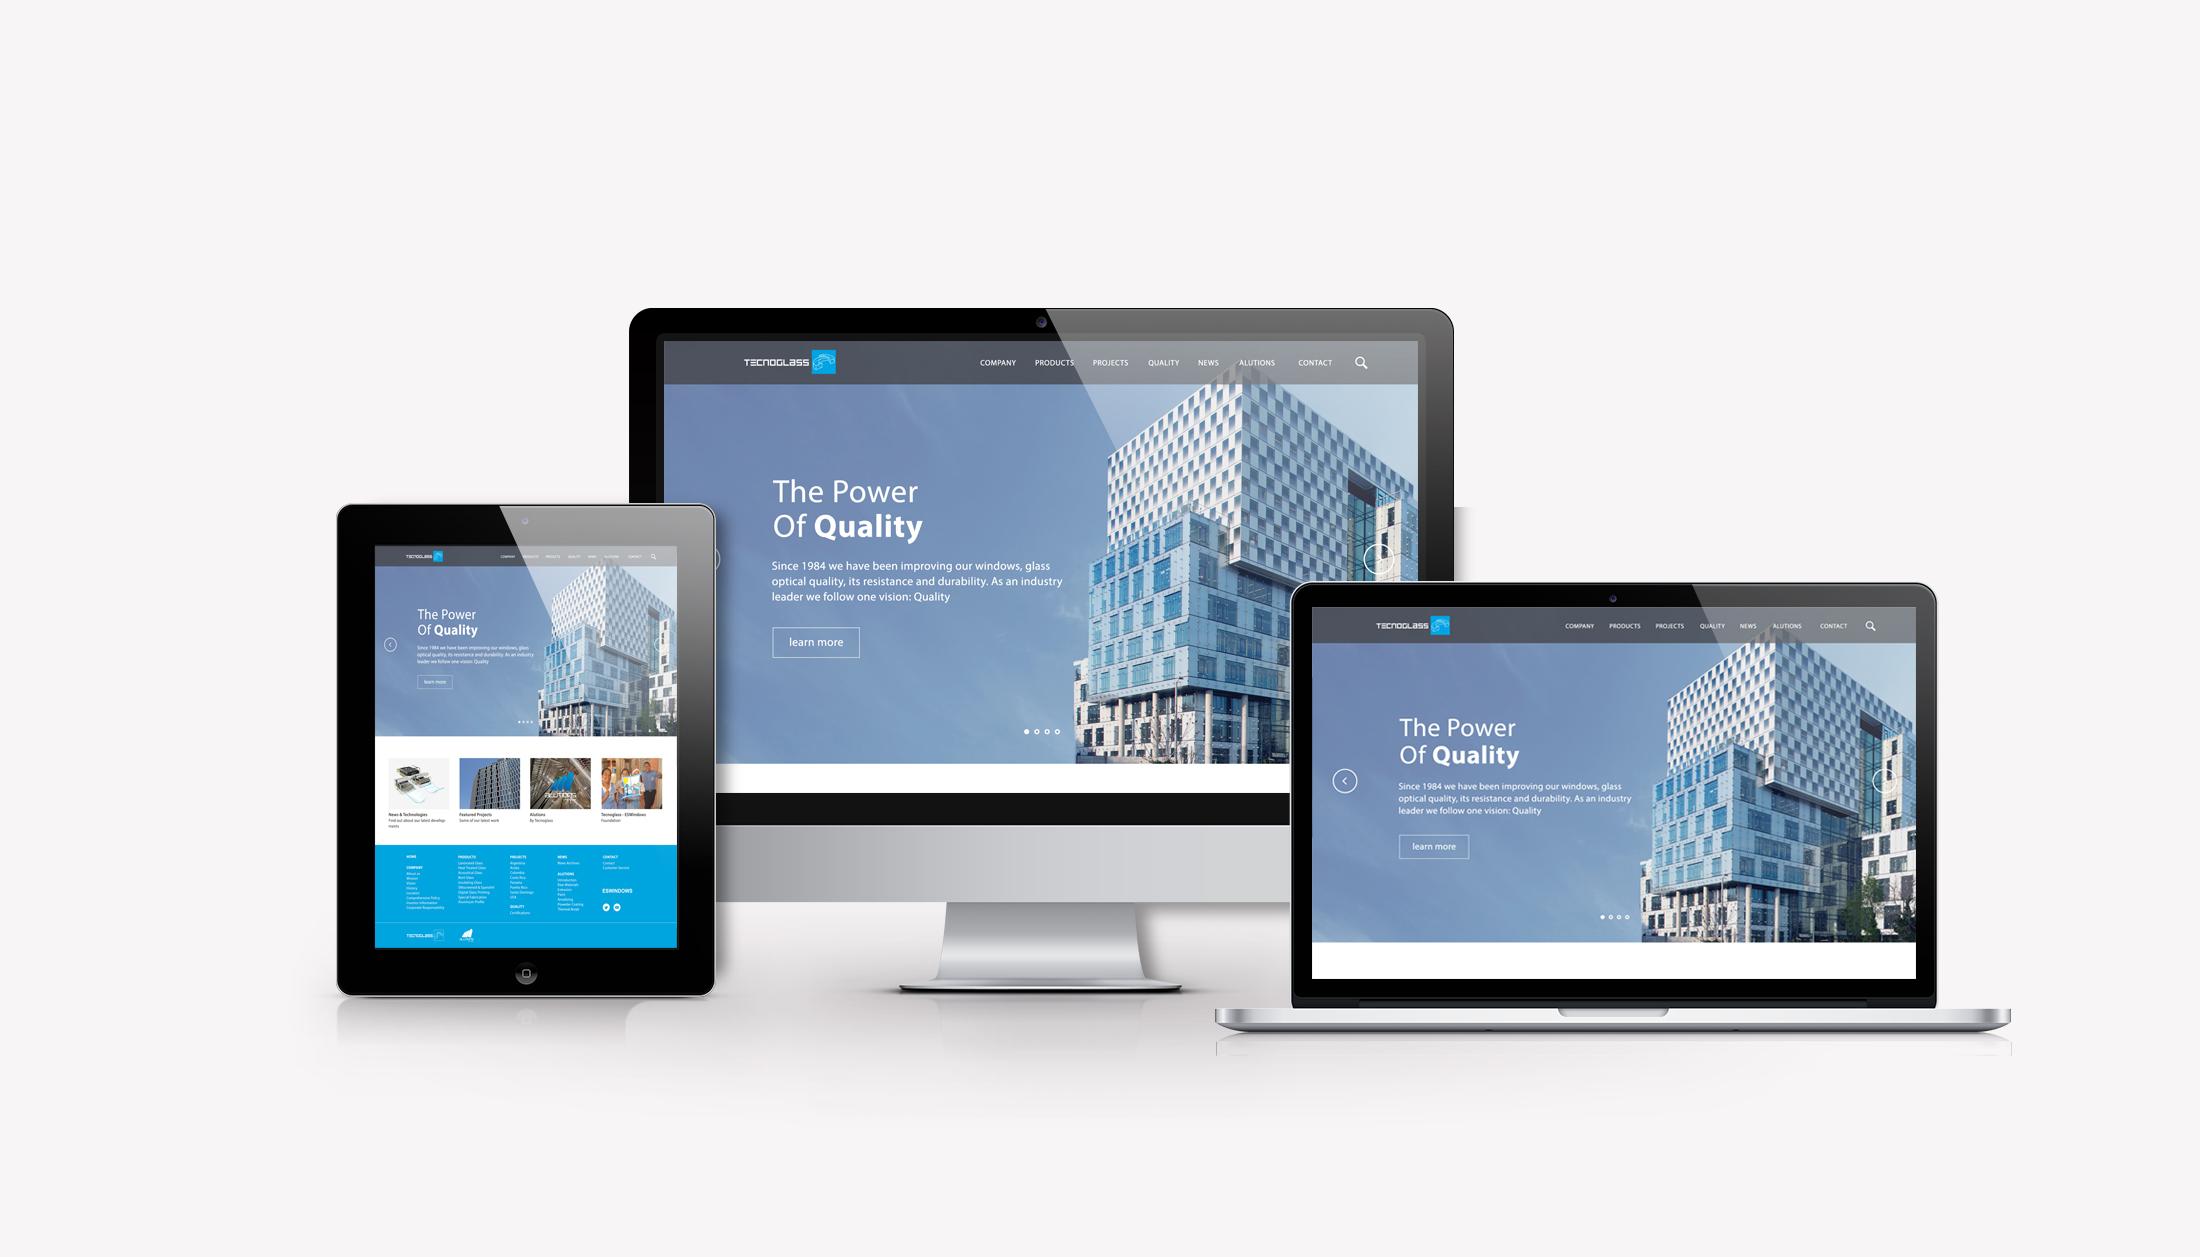 Digital skyline. Tecnoglass. Plvral Advertising and Marketing, Miami.